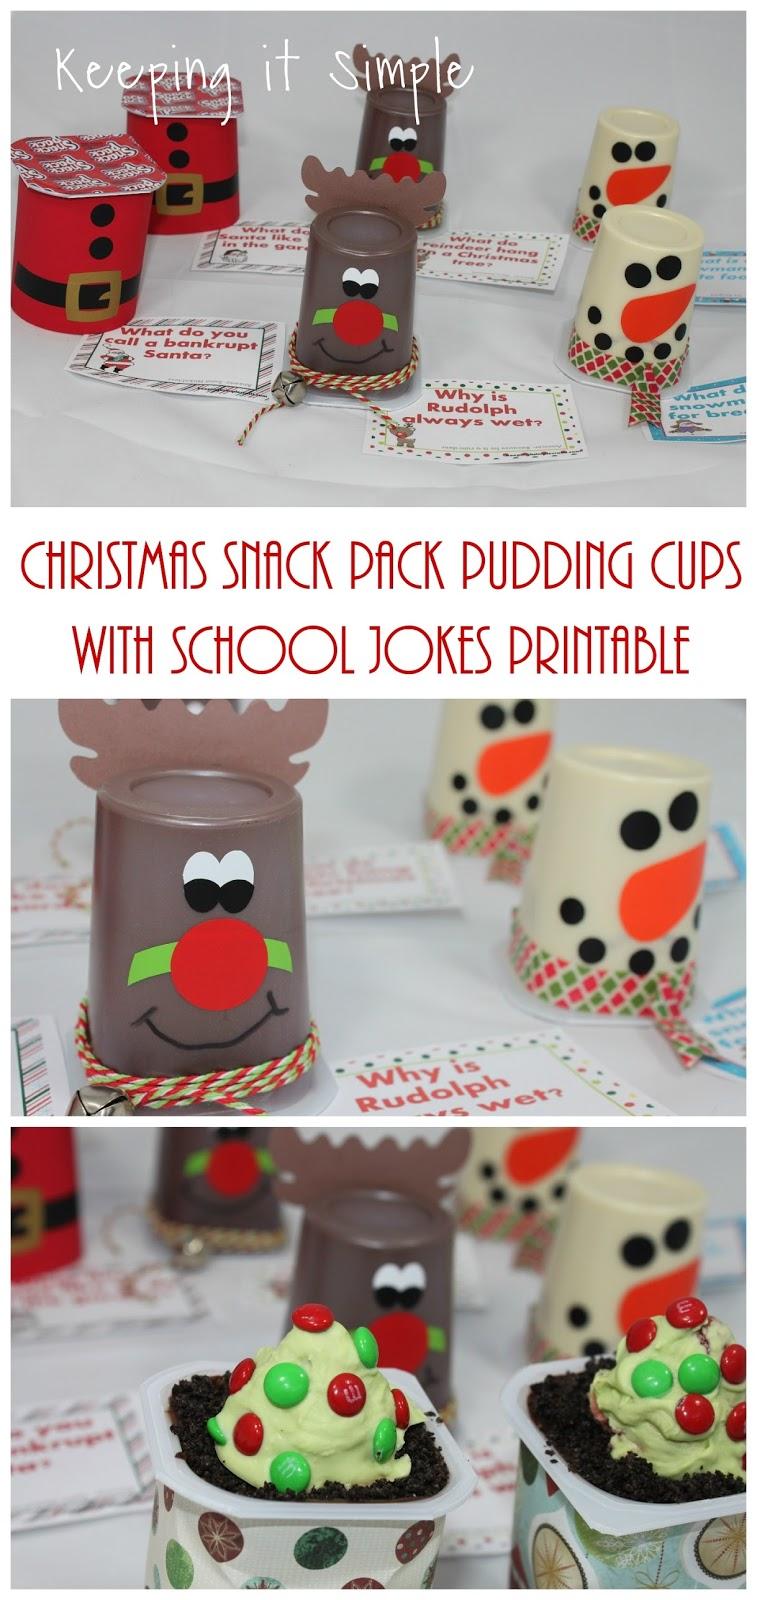 fun christmas treat christmas snack pack pudding cups with school jokes printable